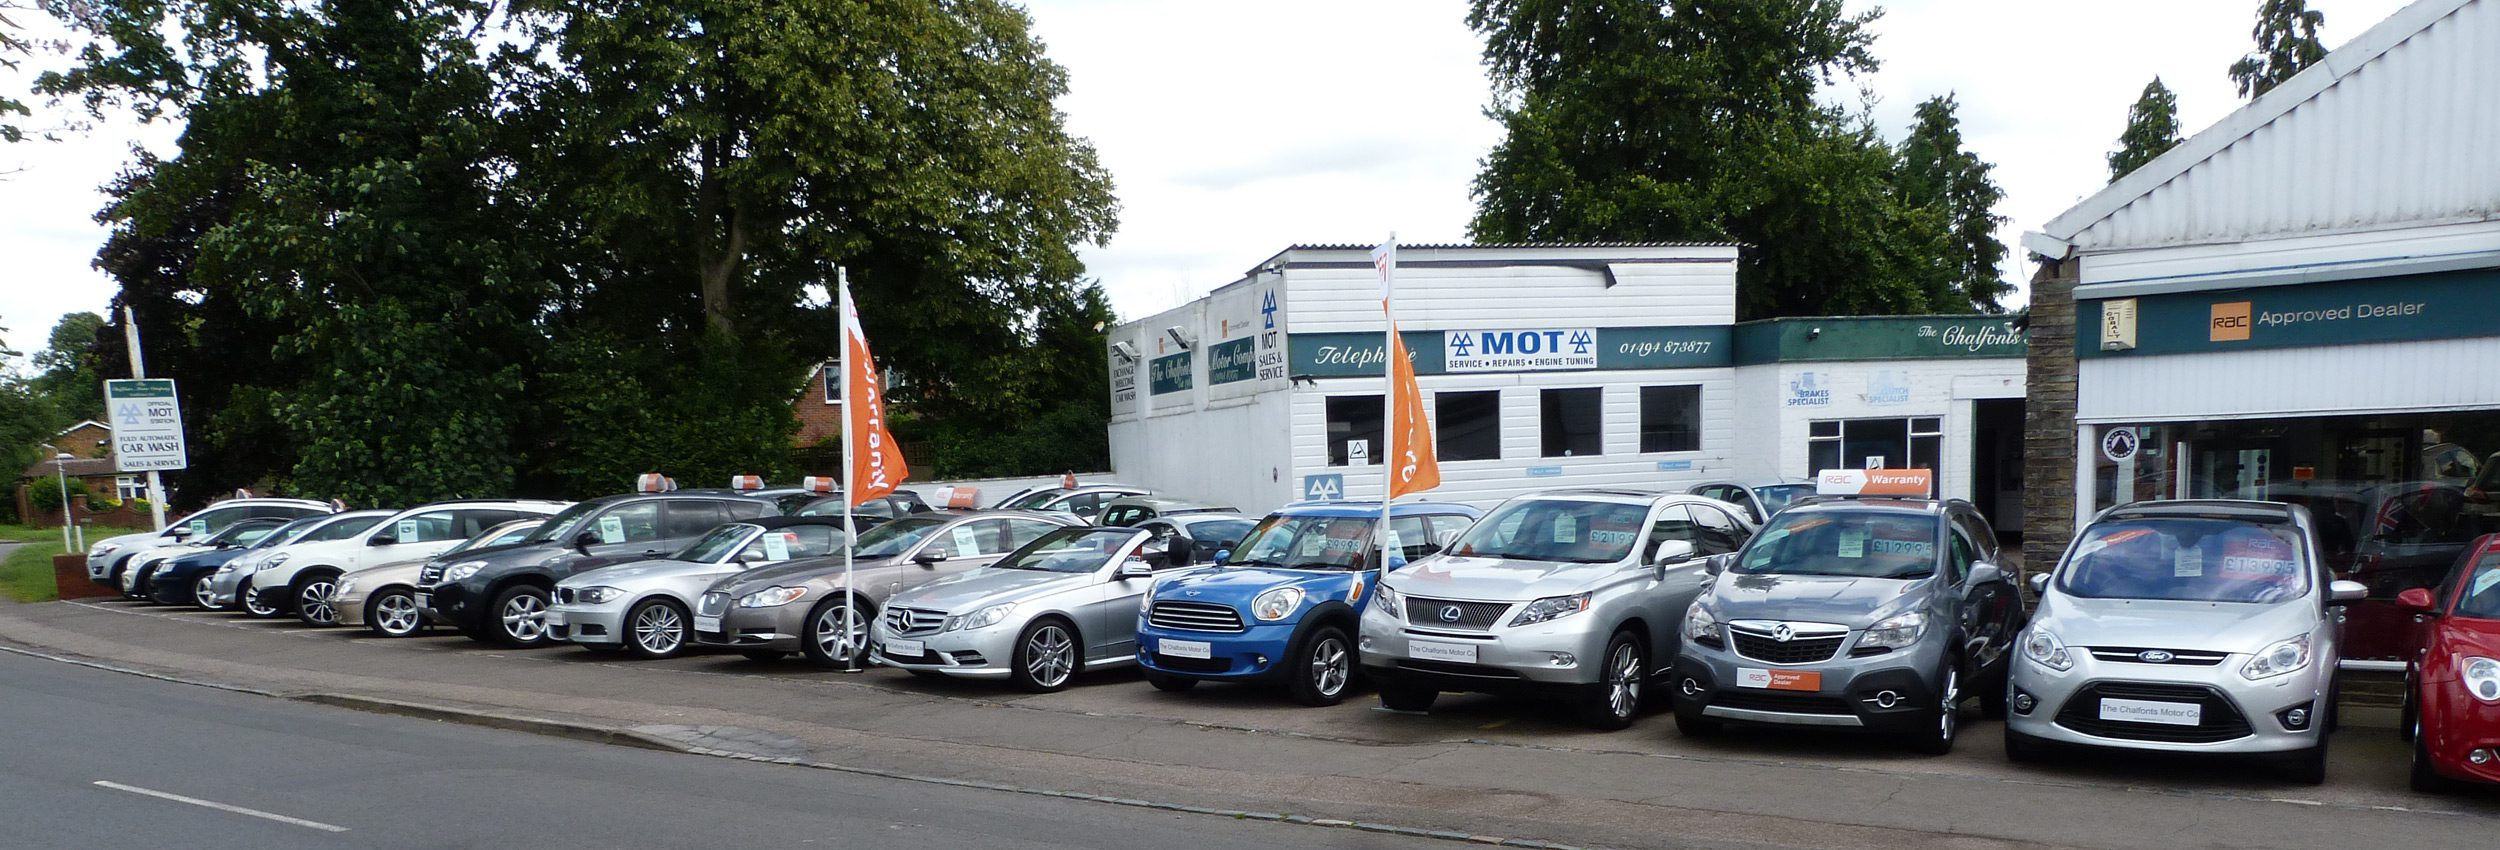 Used Car Sales Gerrards Cross Chalfont Motor Company